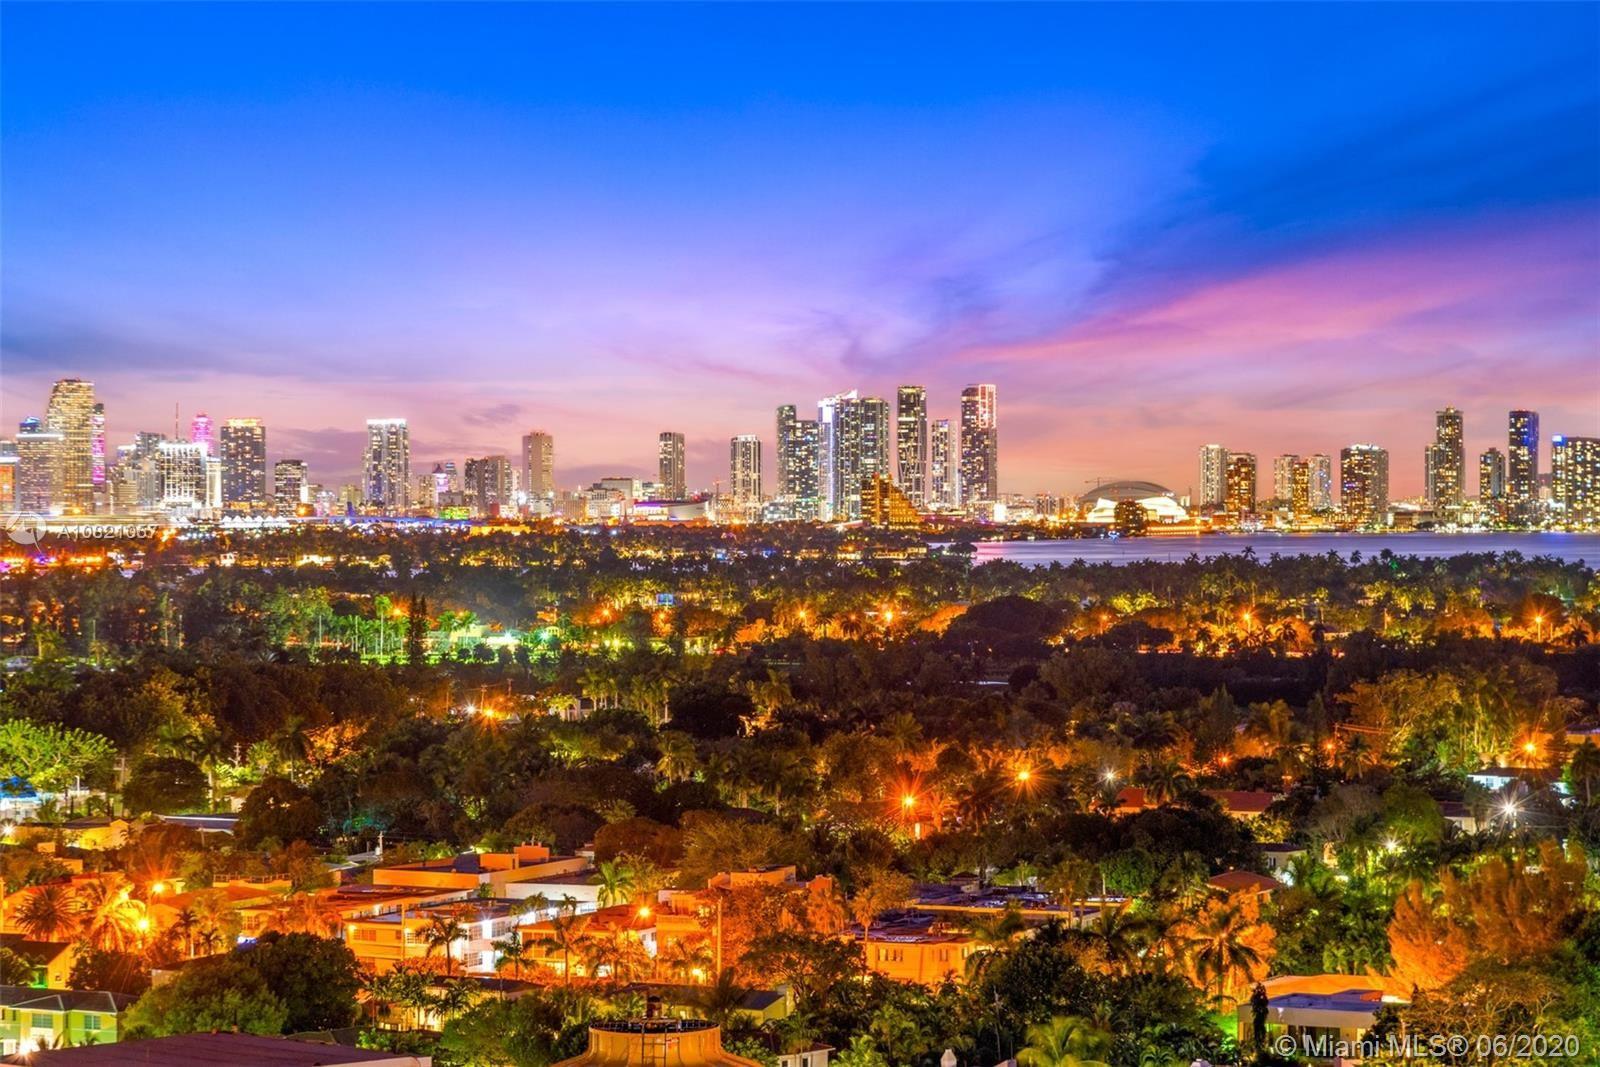 Photo 23 of Listing MLS a10821057 in 3315 Collins Ave #PH-B Miami Beach FL 33140